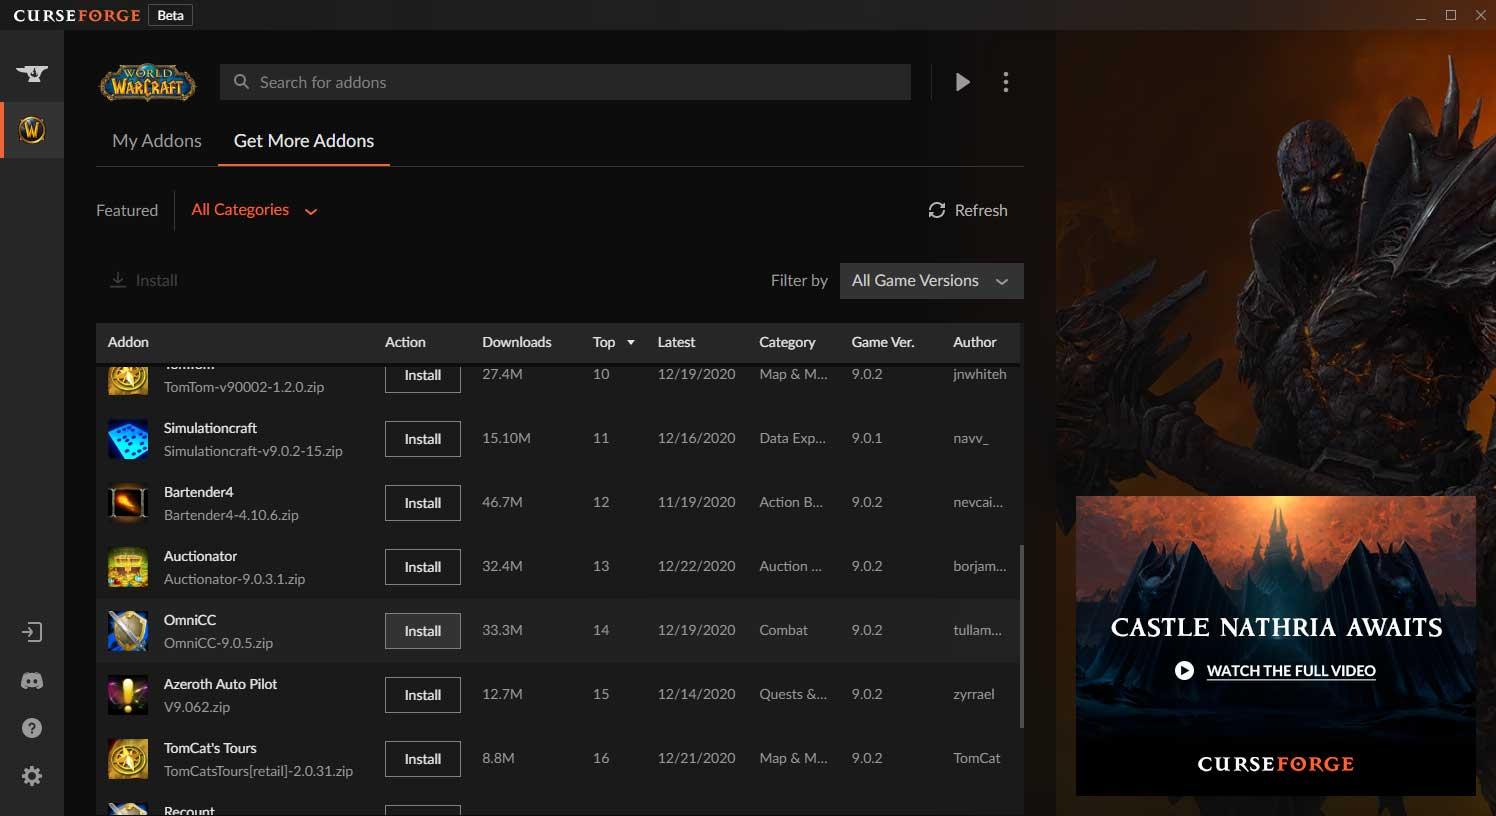 World of Warcraft Curseforge